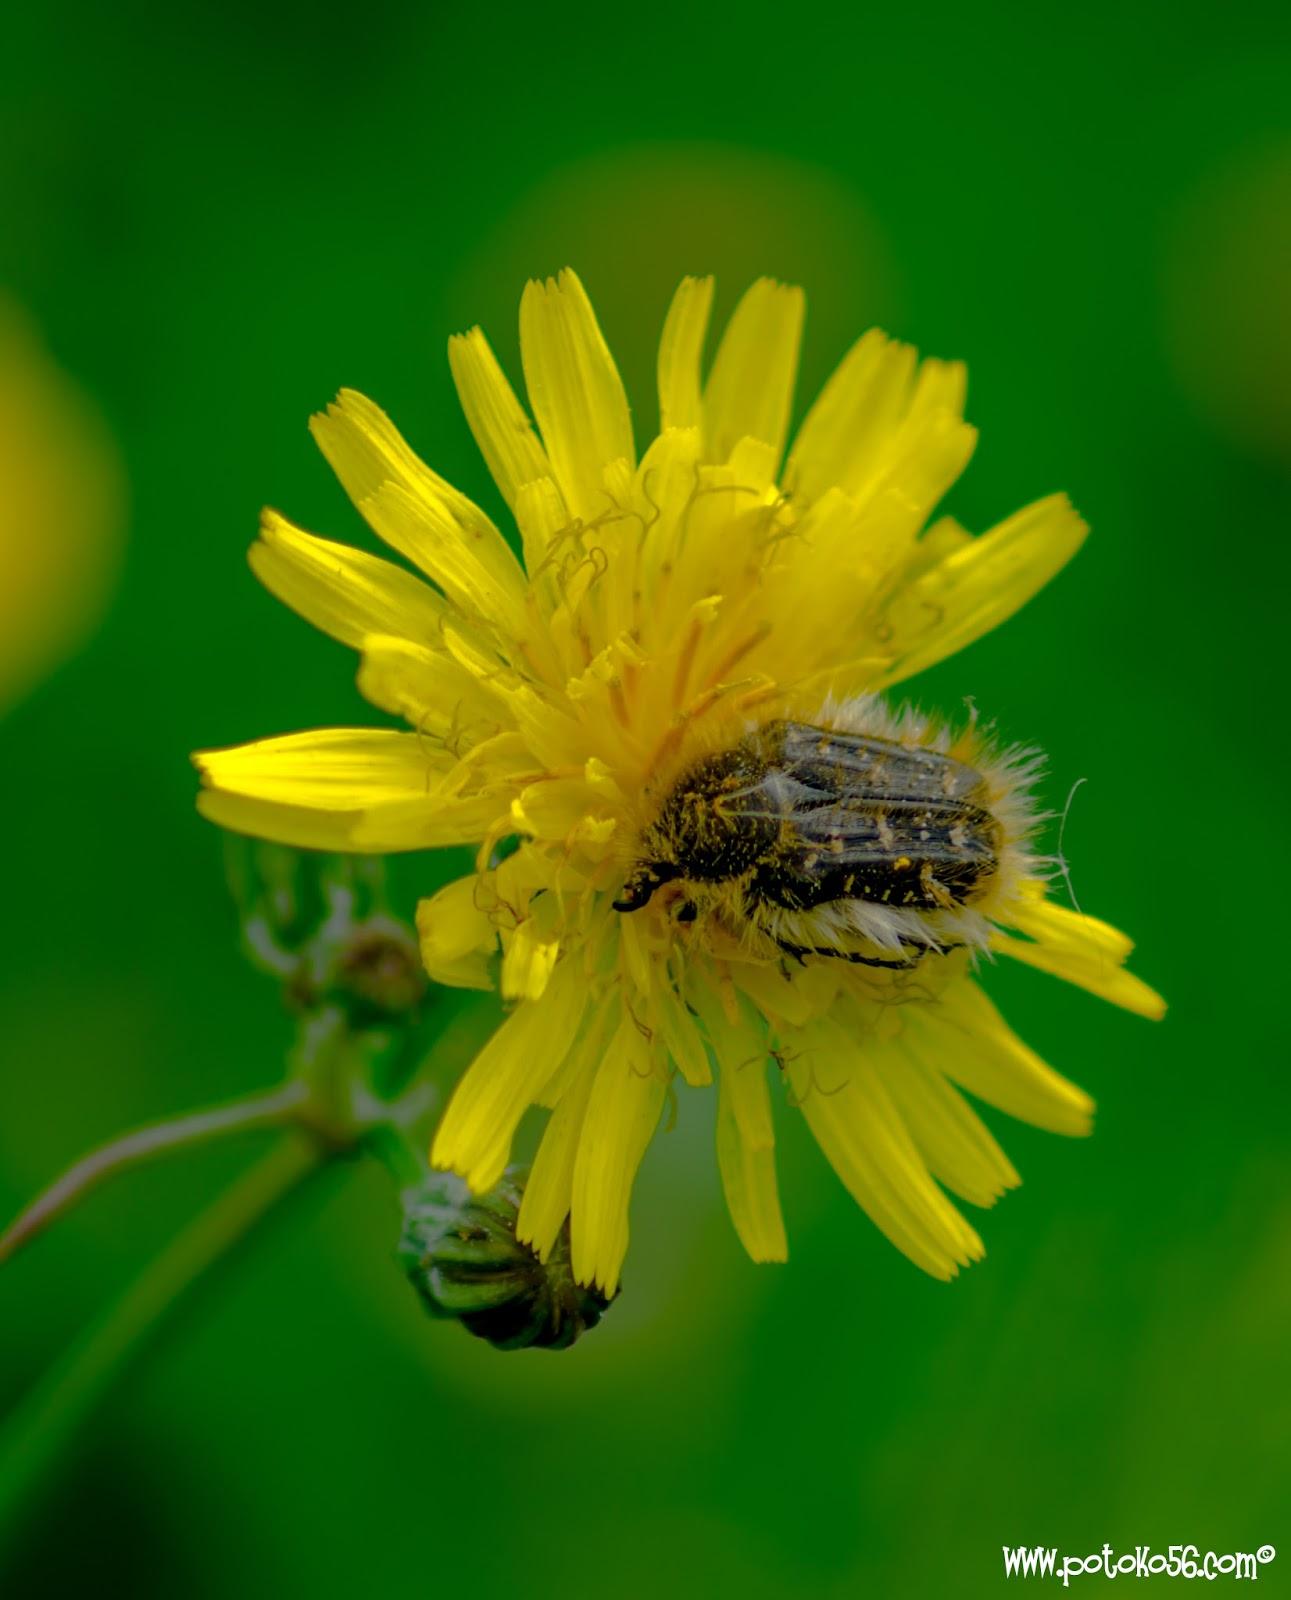 Un escarabajo peludo  (Tropinota hirta) polinizando un crisantemo silvestre